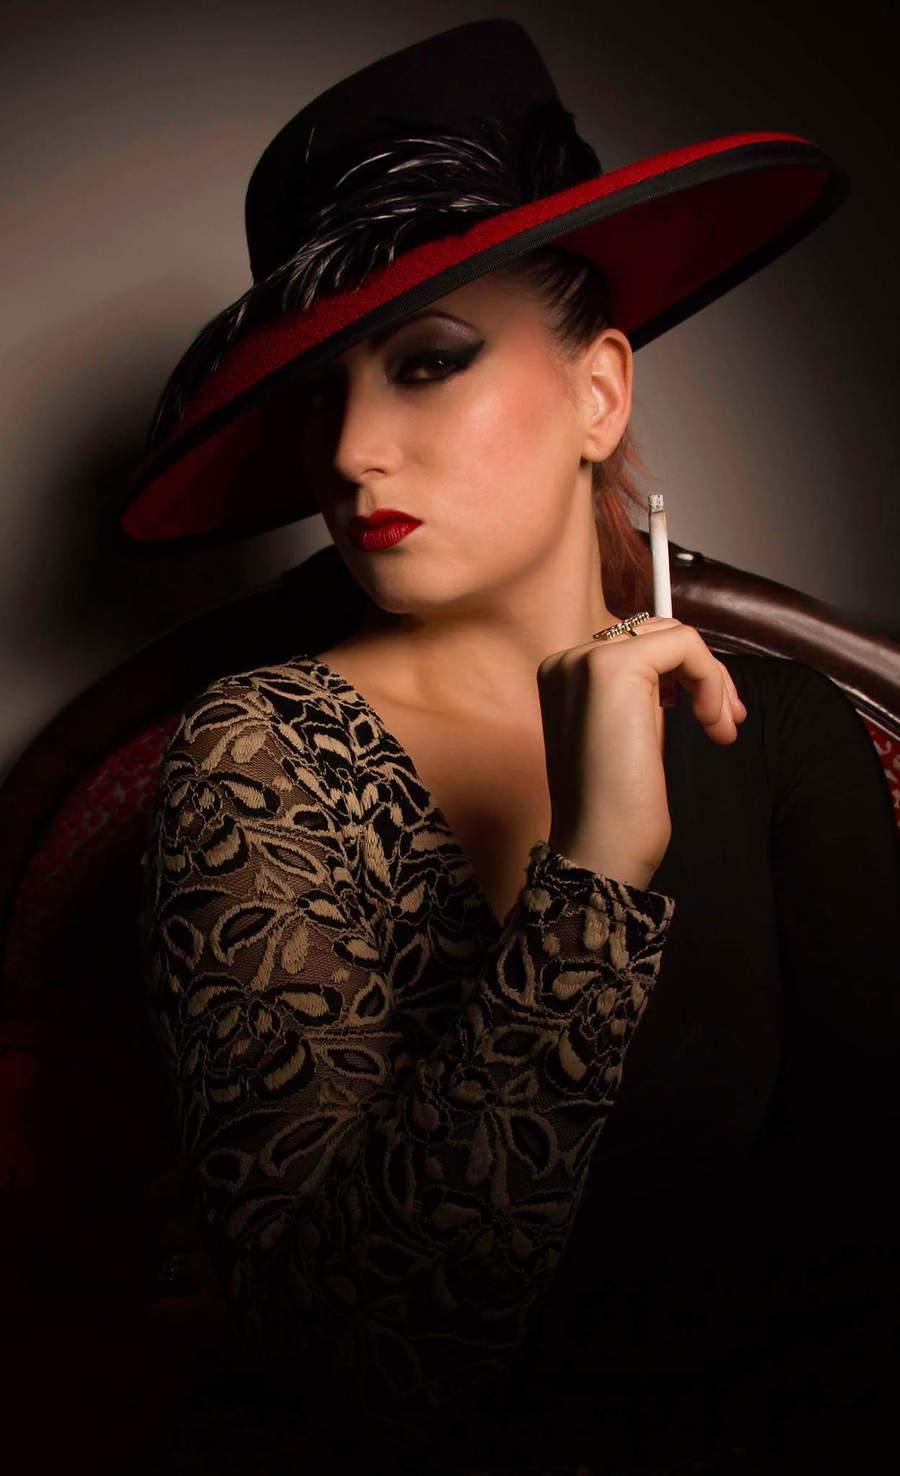 Seduction and Smoke / Photography by I M  A G E ~ I S ~ E V E R Y T H I N G, Model Alex Kelsey, Makeup by Alex Kelsey, Stylist Alex Kelsey / Uploaded 14th September 2015 @ 04:29 PM